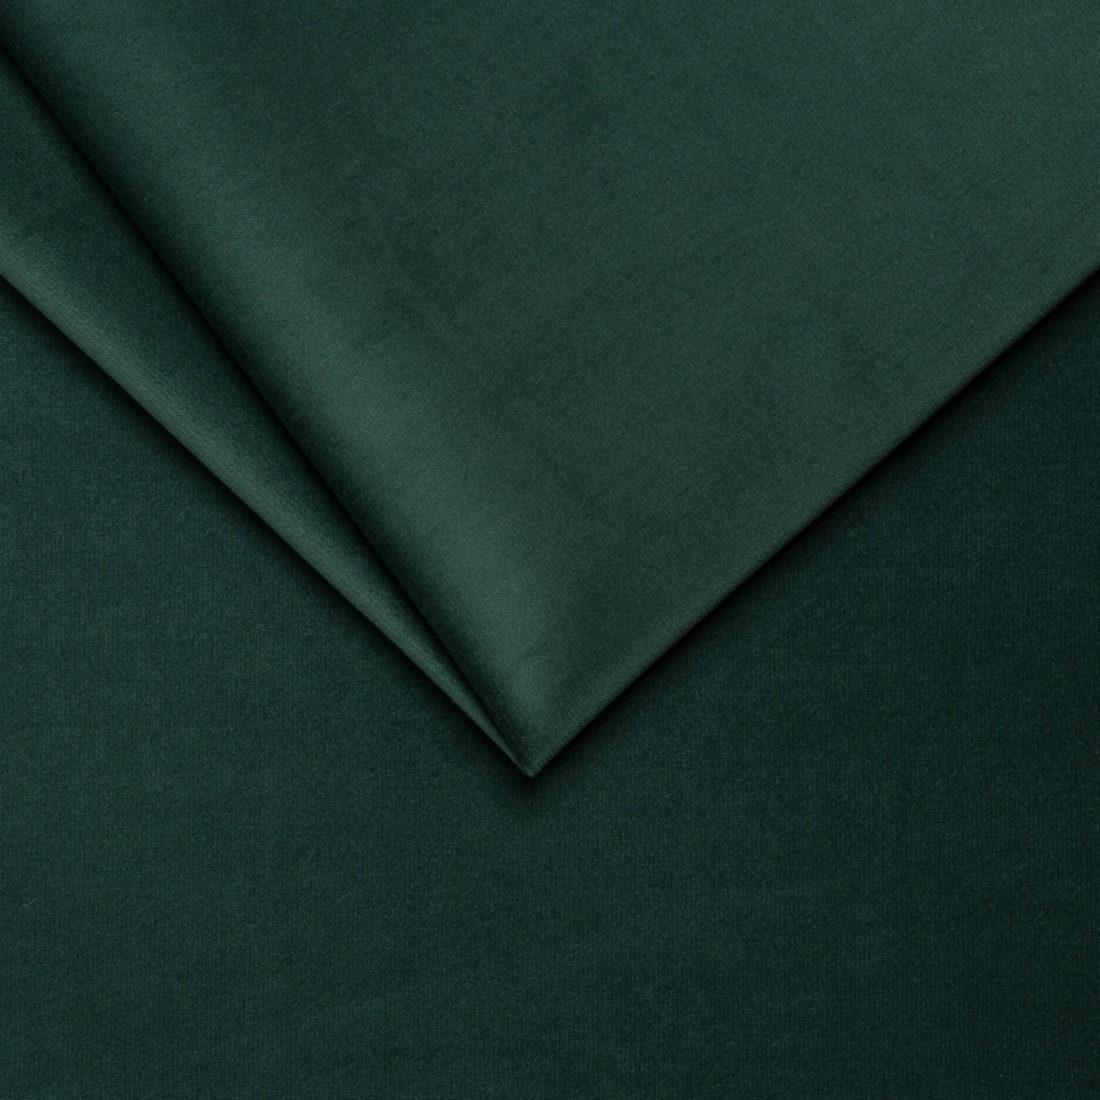 Мебельная ткань Velluto 10 Dark Green, велюр